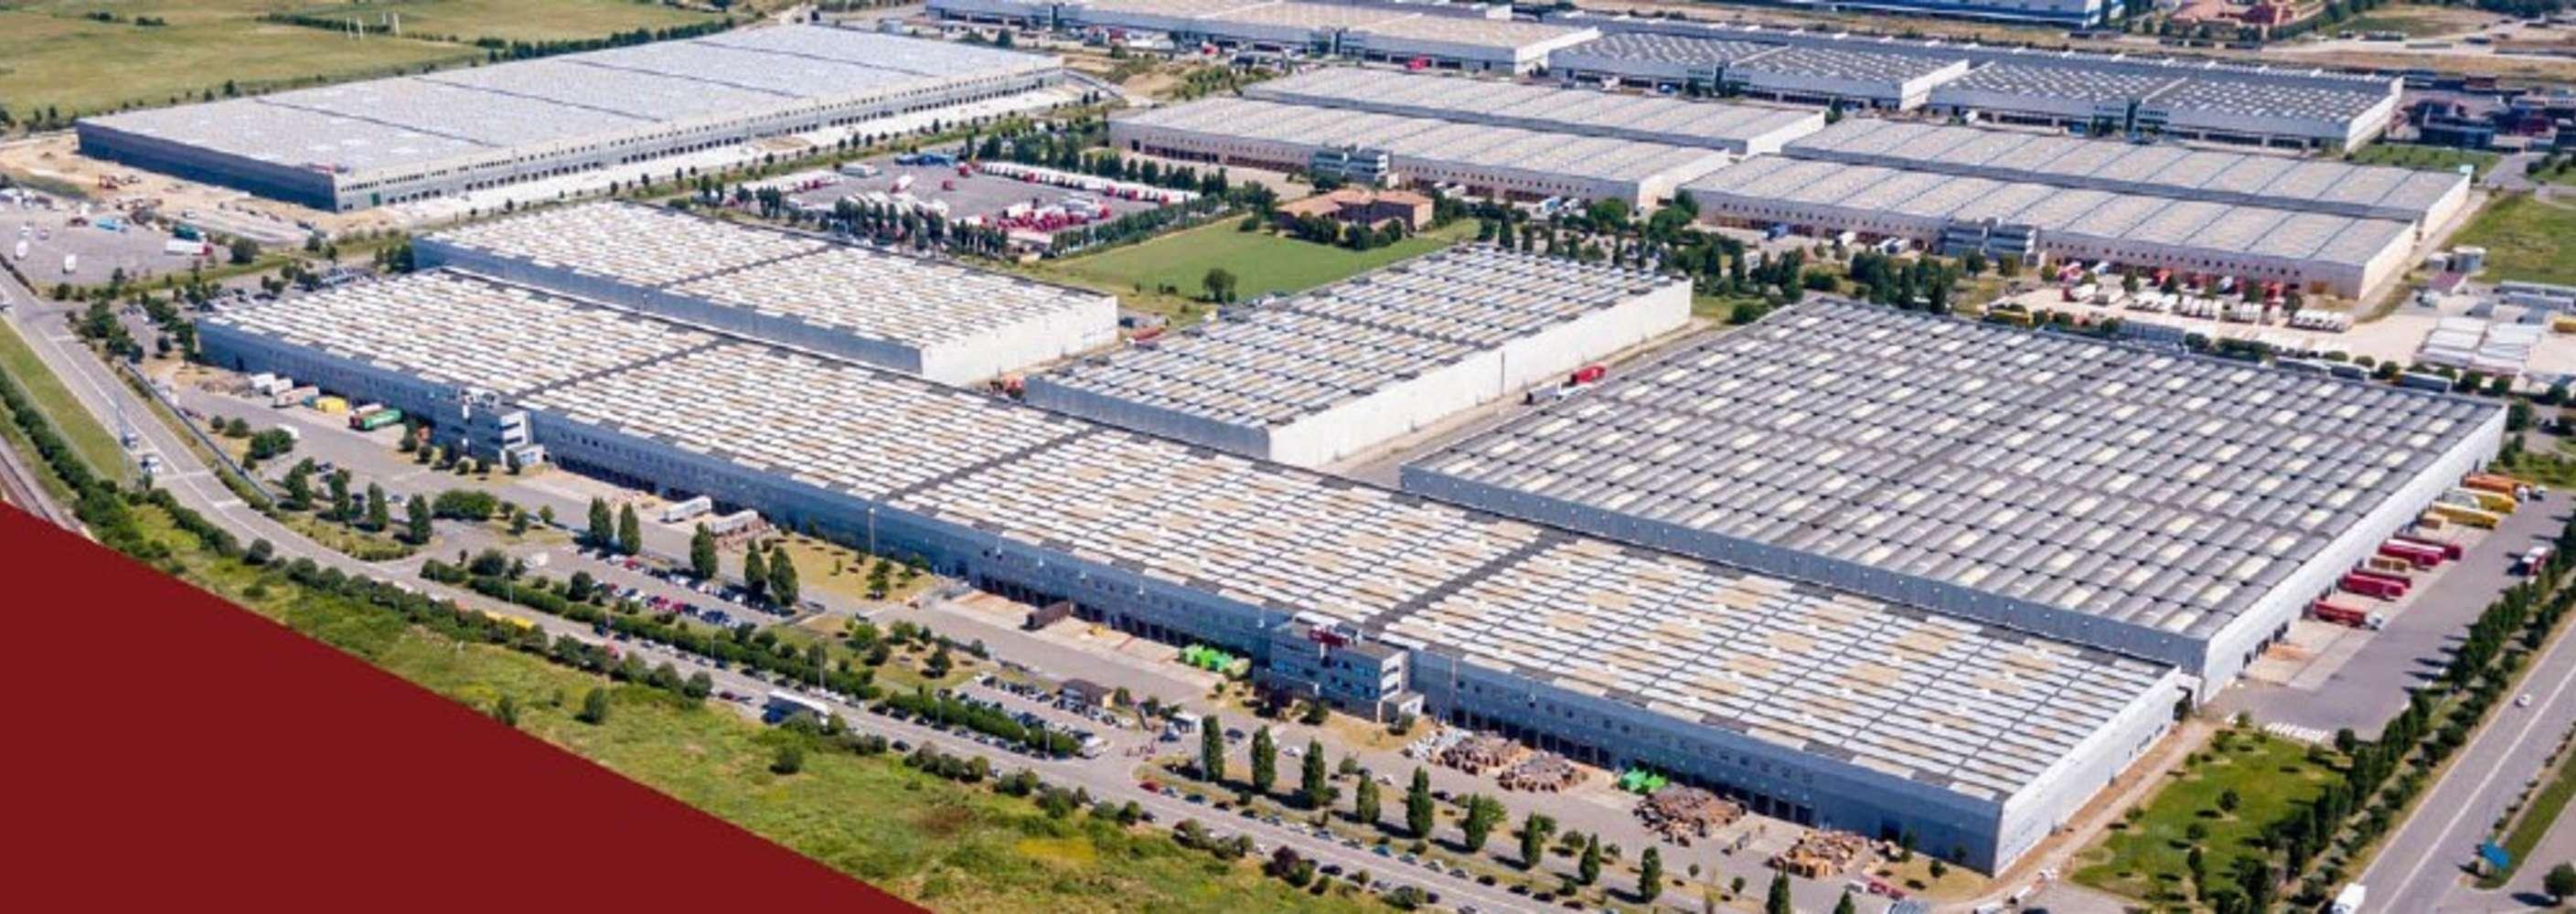 Magazzini industriali e logistici Piacenza, 29122 - Piacenza BTS